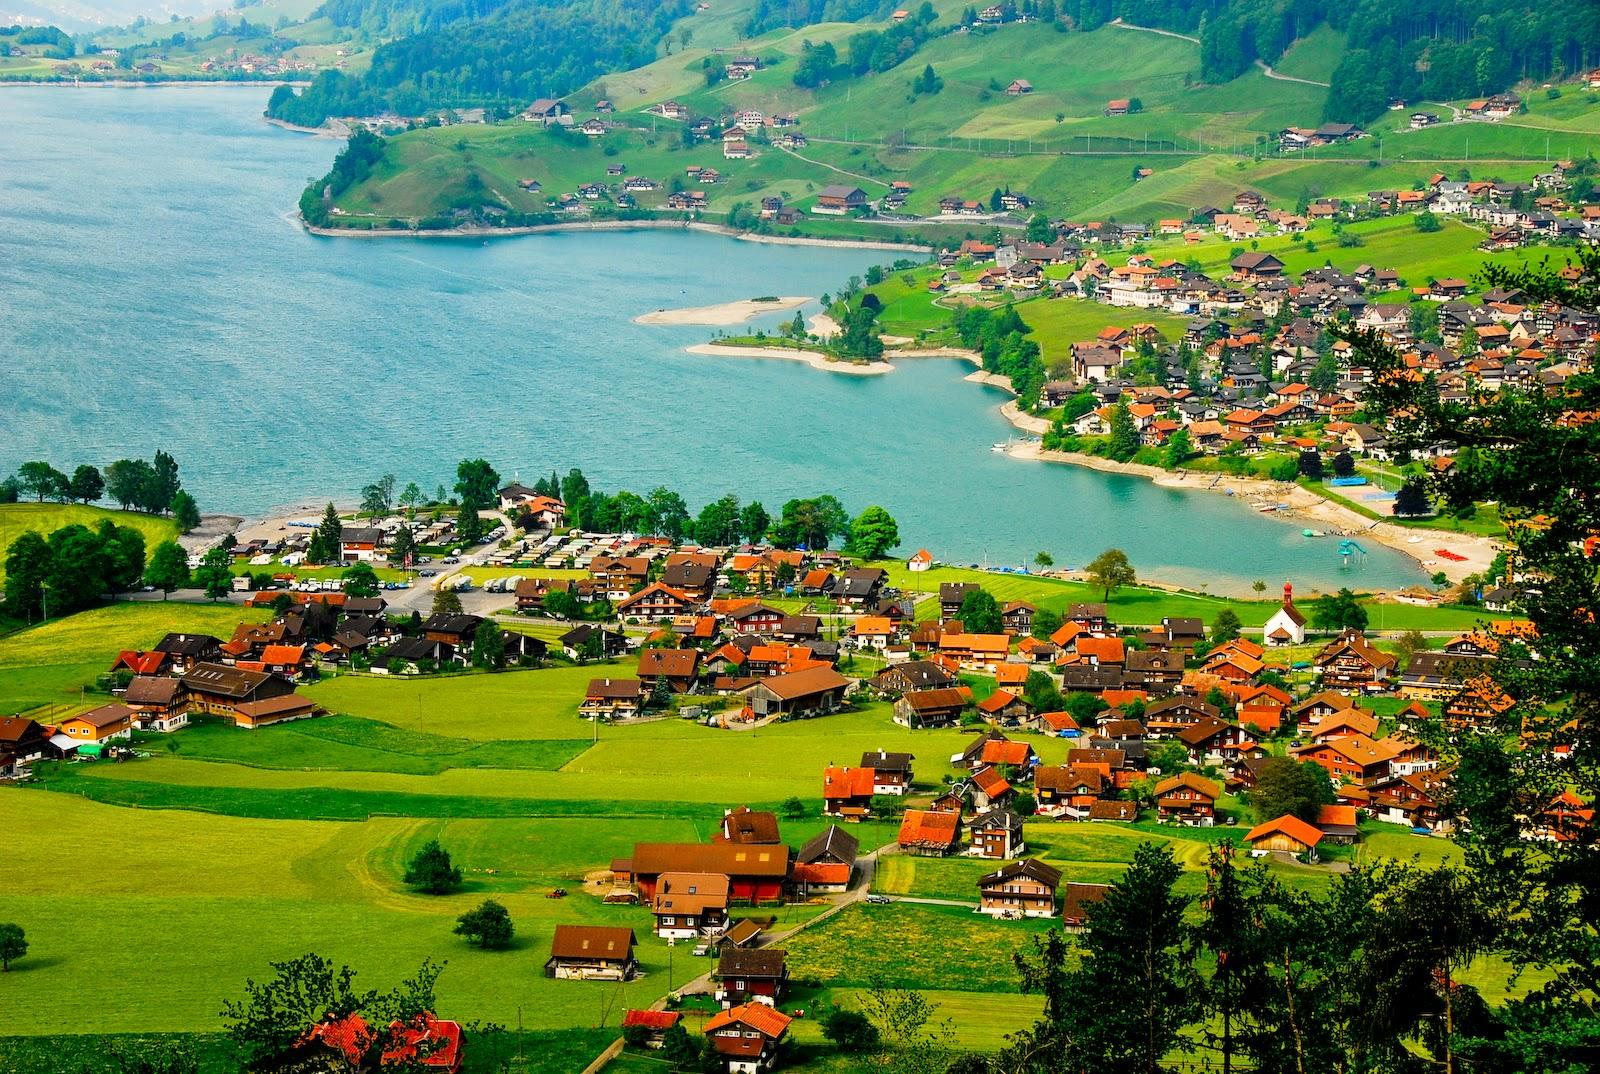 Interlaken Switzerland Wallpaper and Background Image 1600x1074 1600x1074